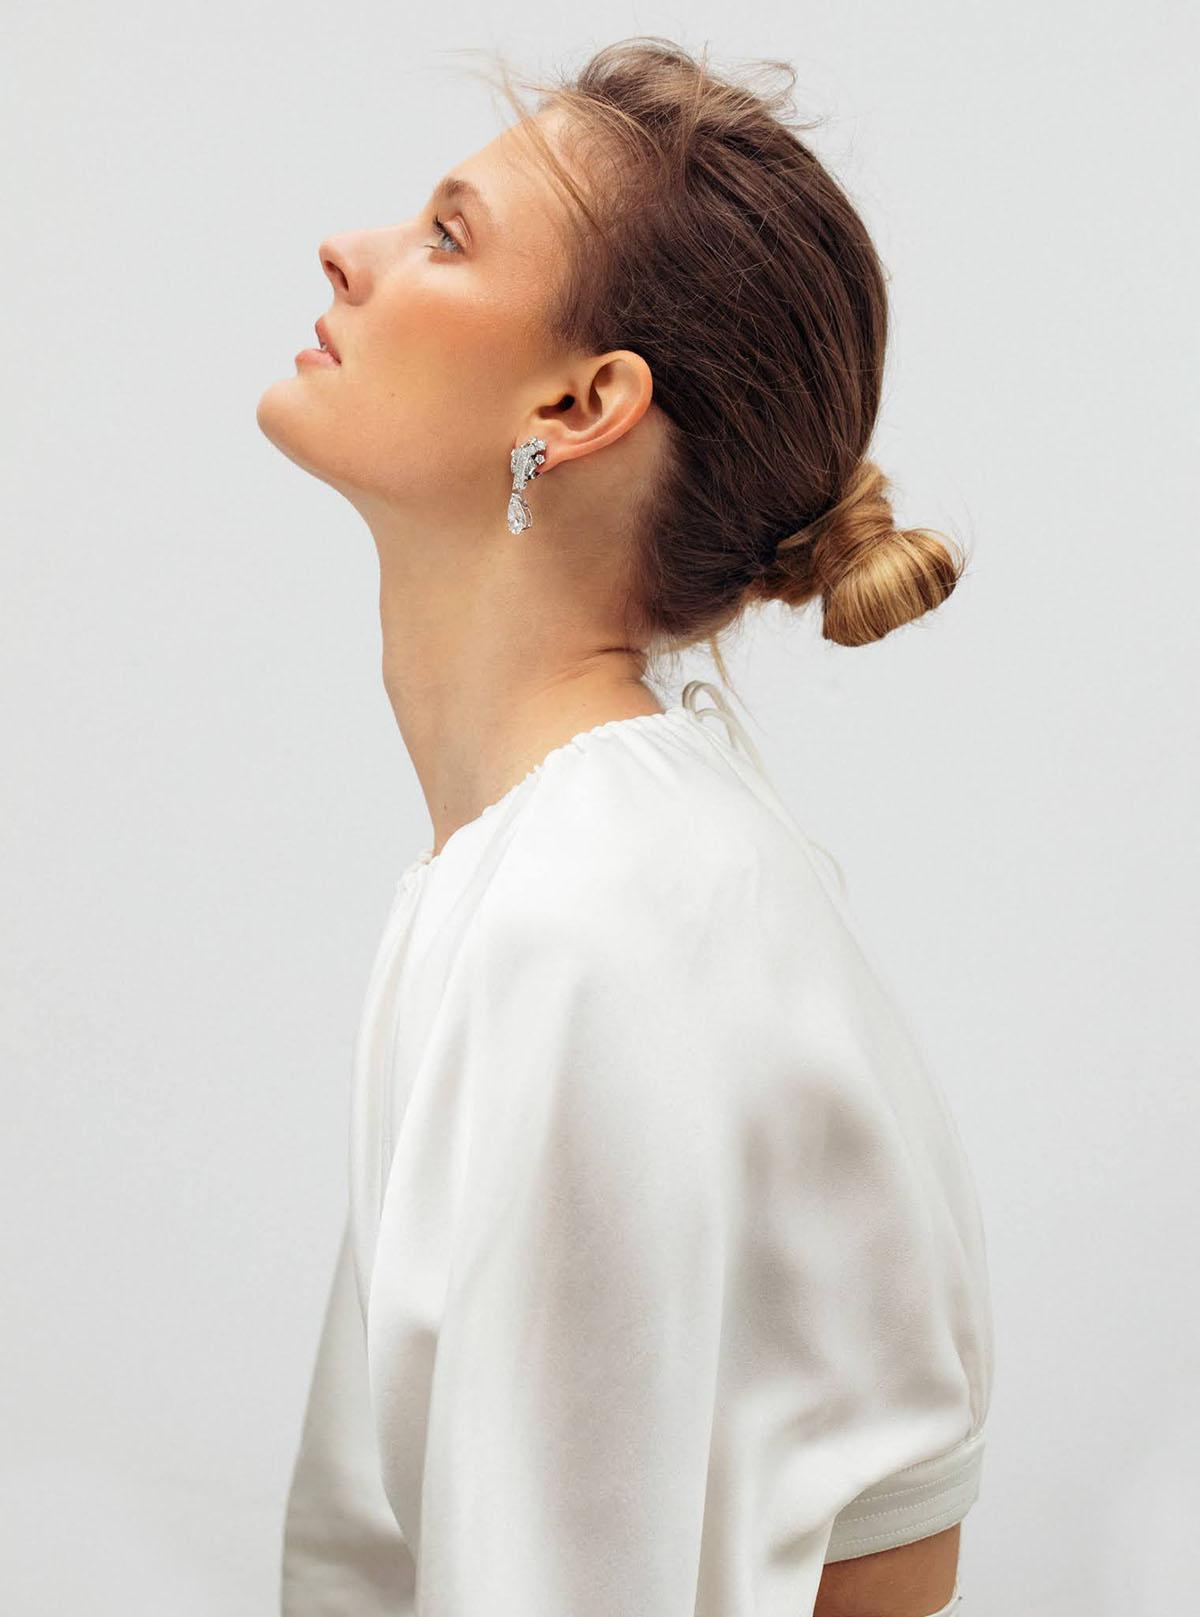 Constance Jablonski covers Harper's Bazaar UK May 2021 by Betina du Toit